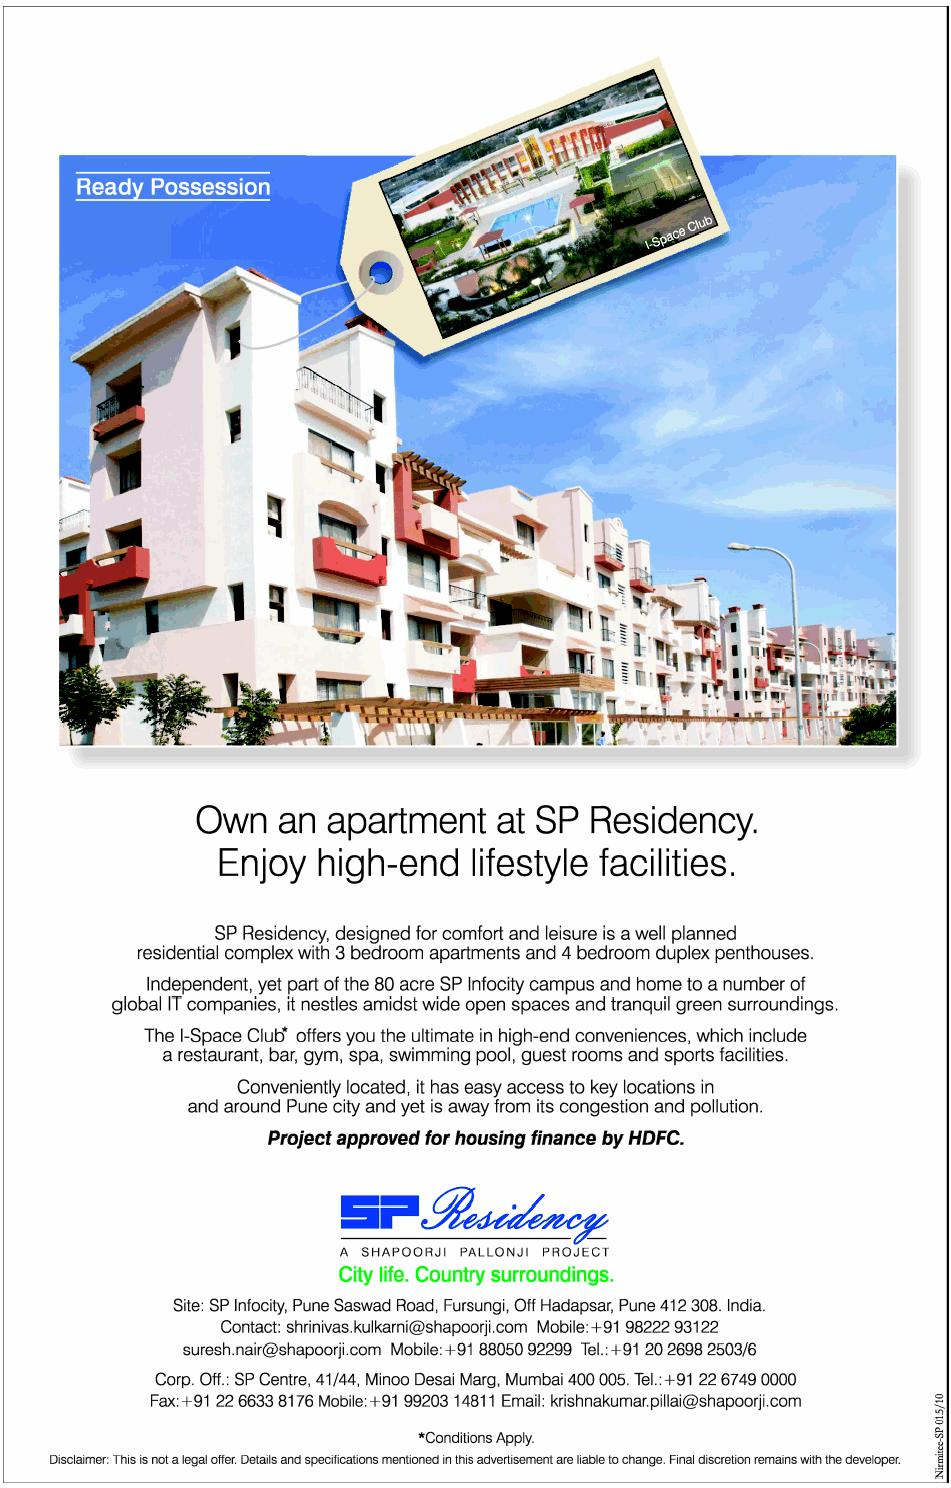 SP Residency, SP Infocity, Fursungi, Hadapsar, Pune 412 308